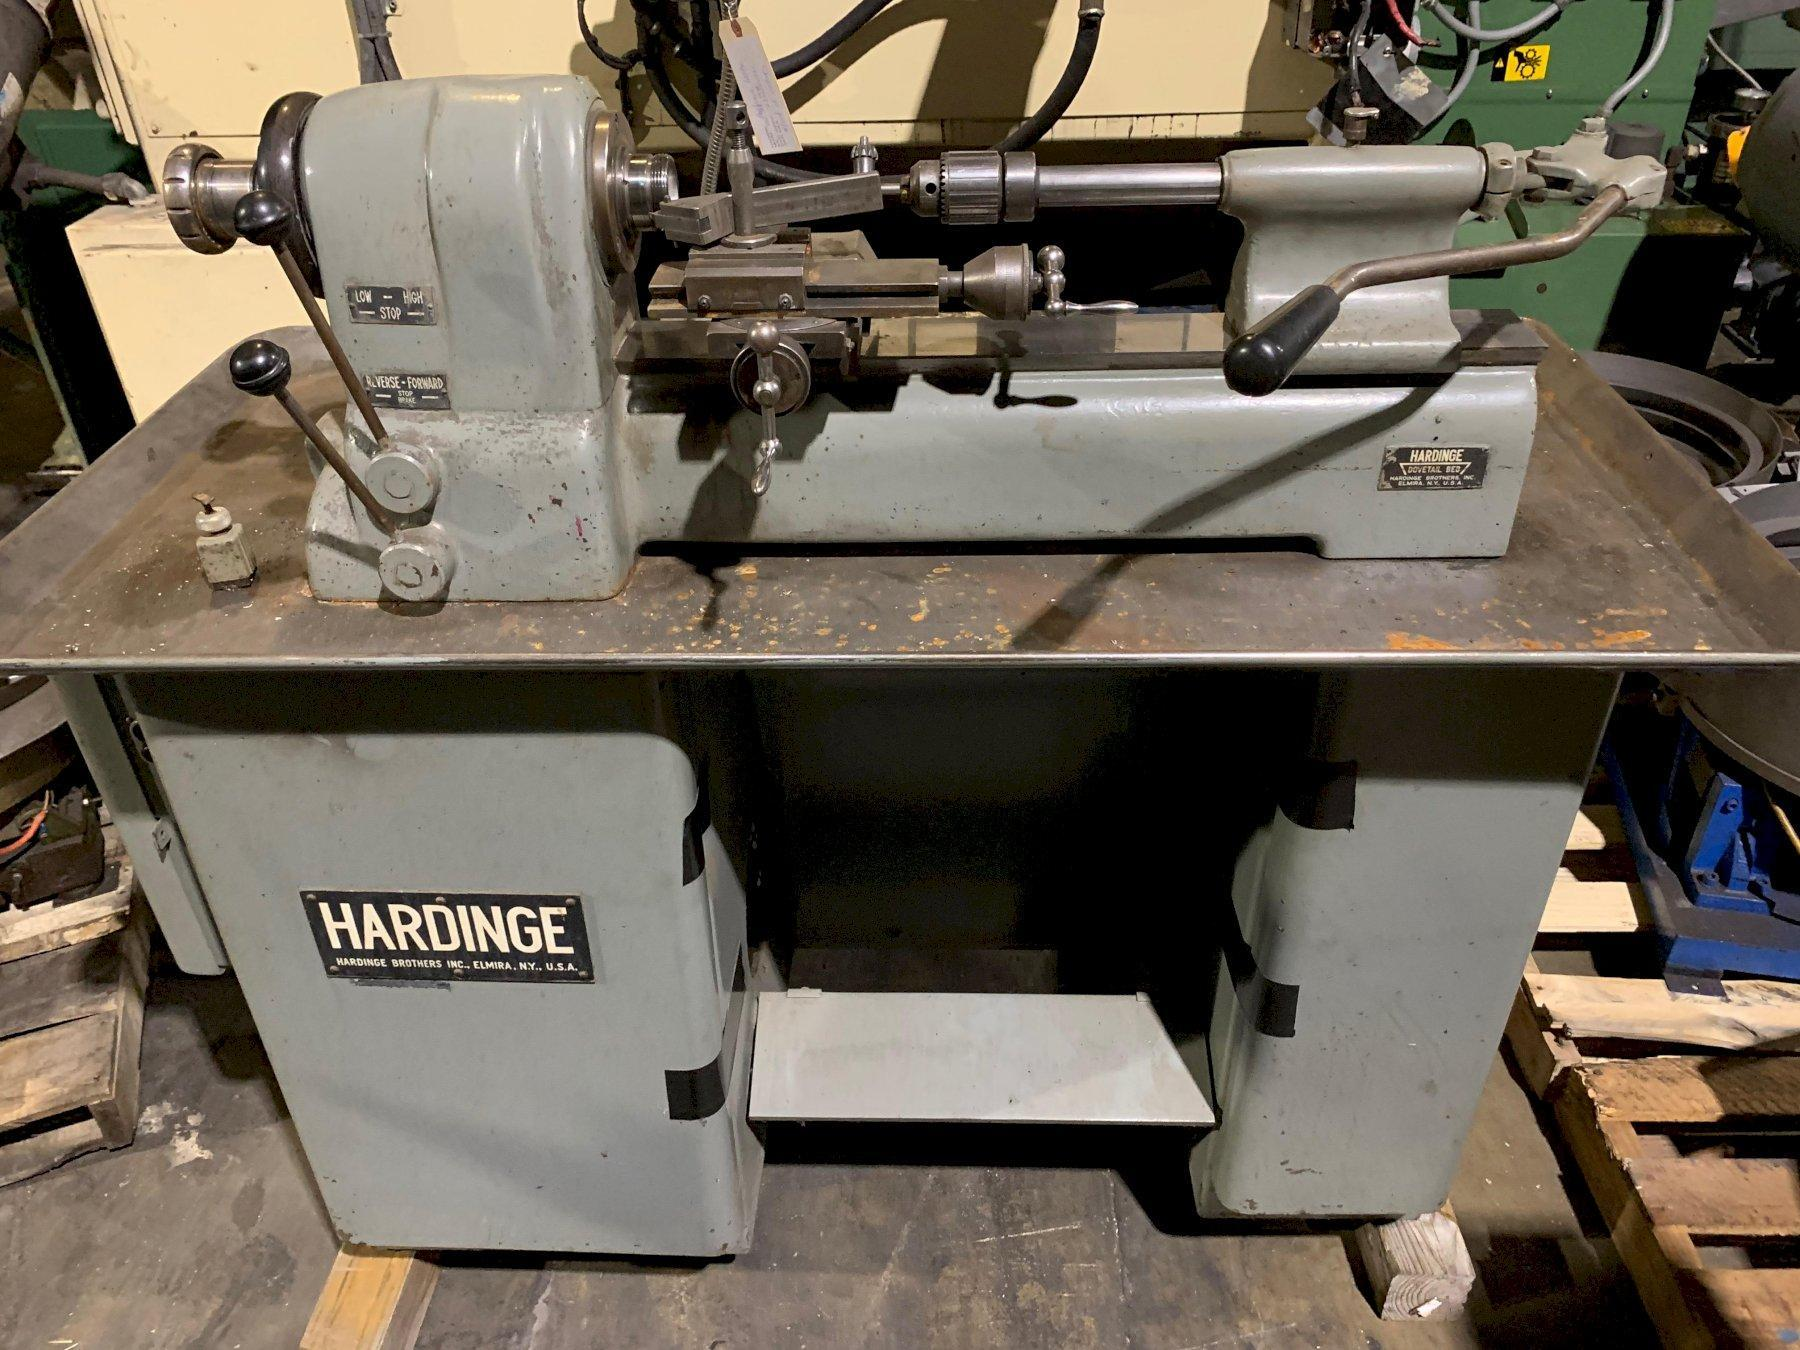 Hardinge DV-59 Lathe